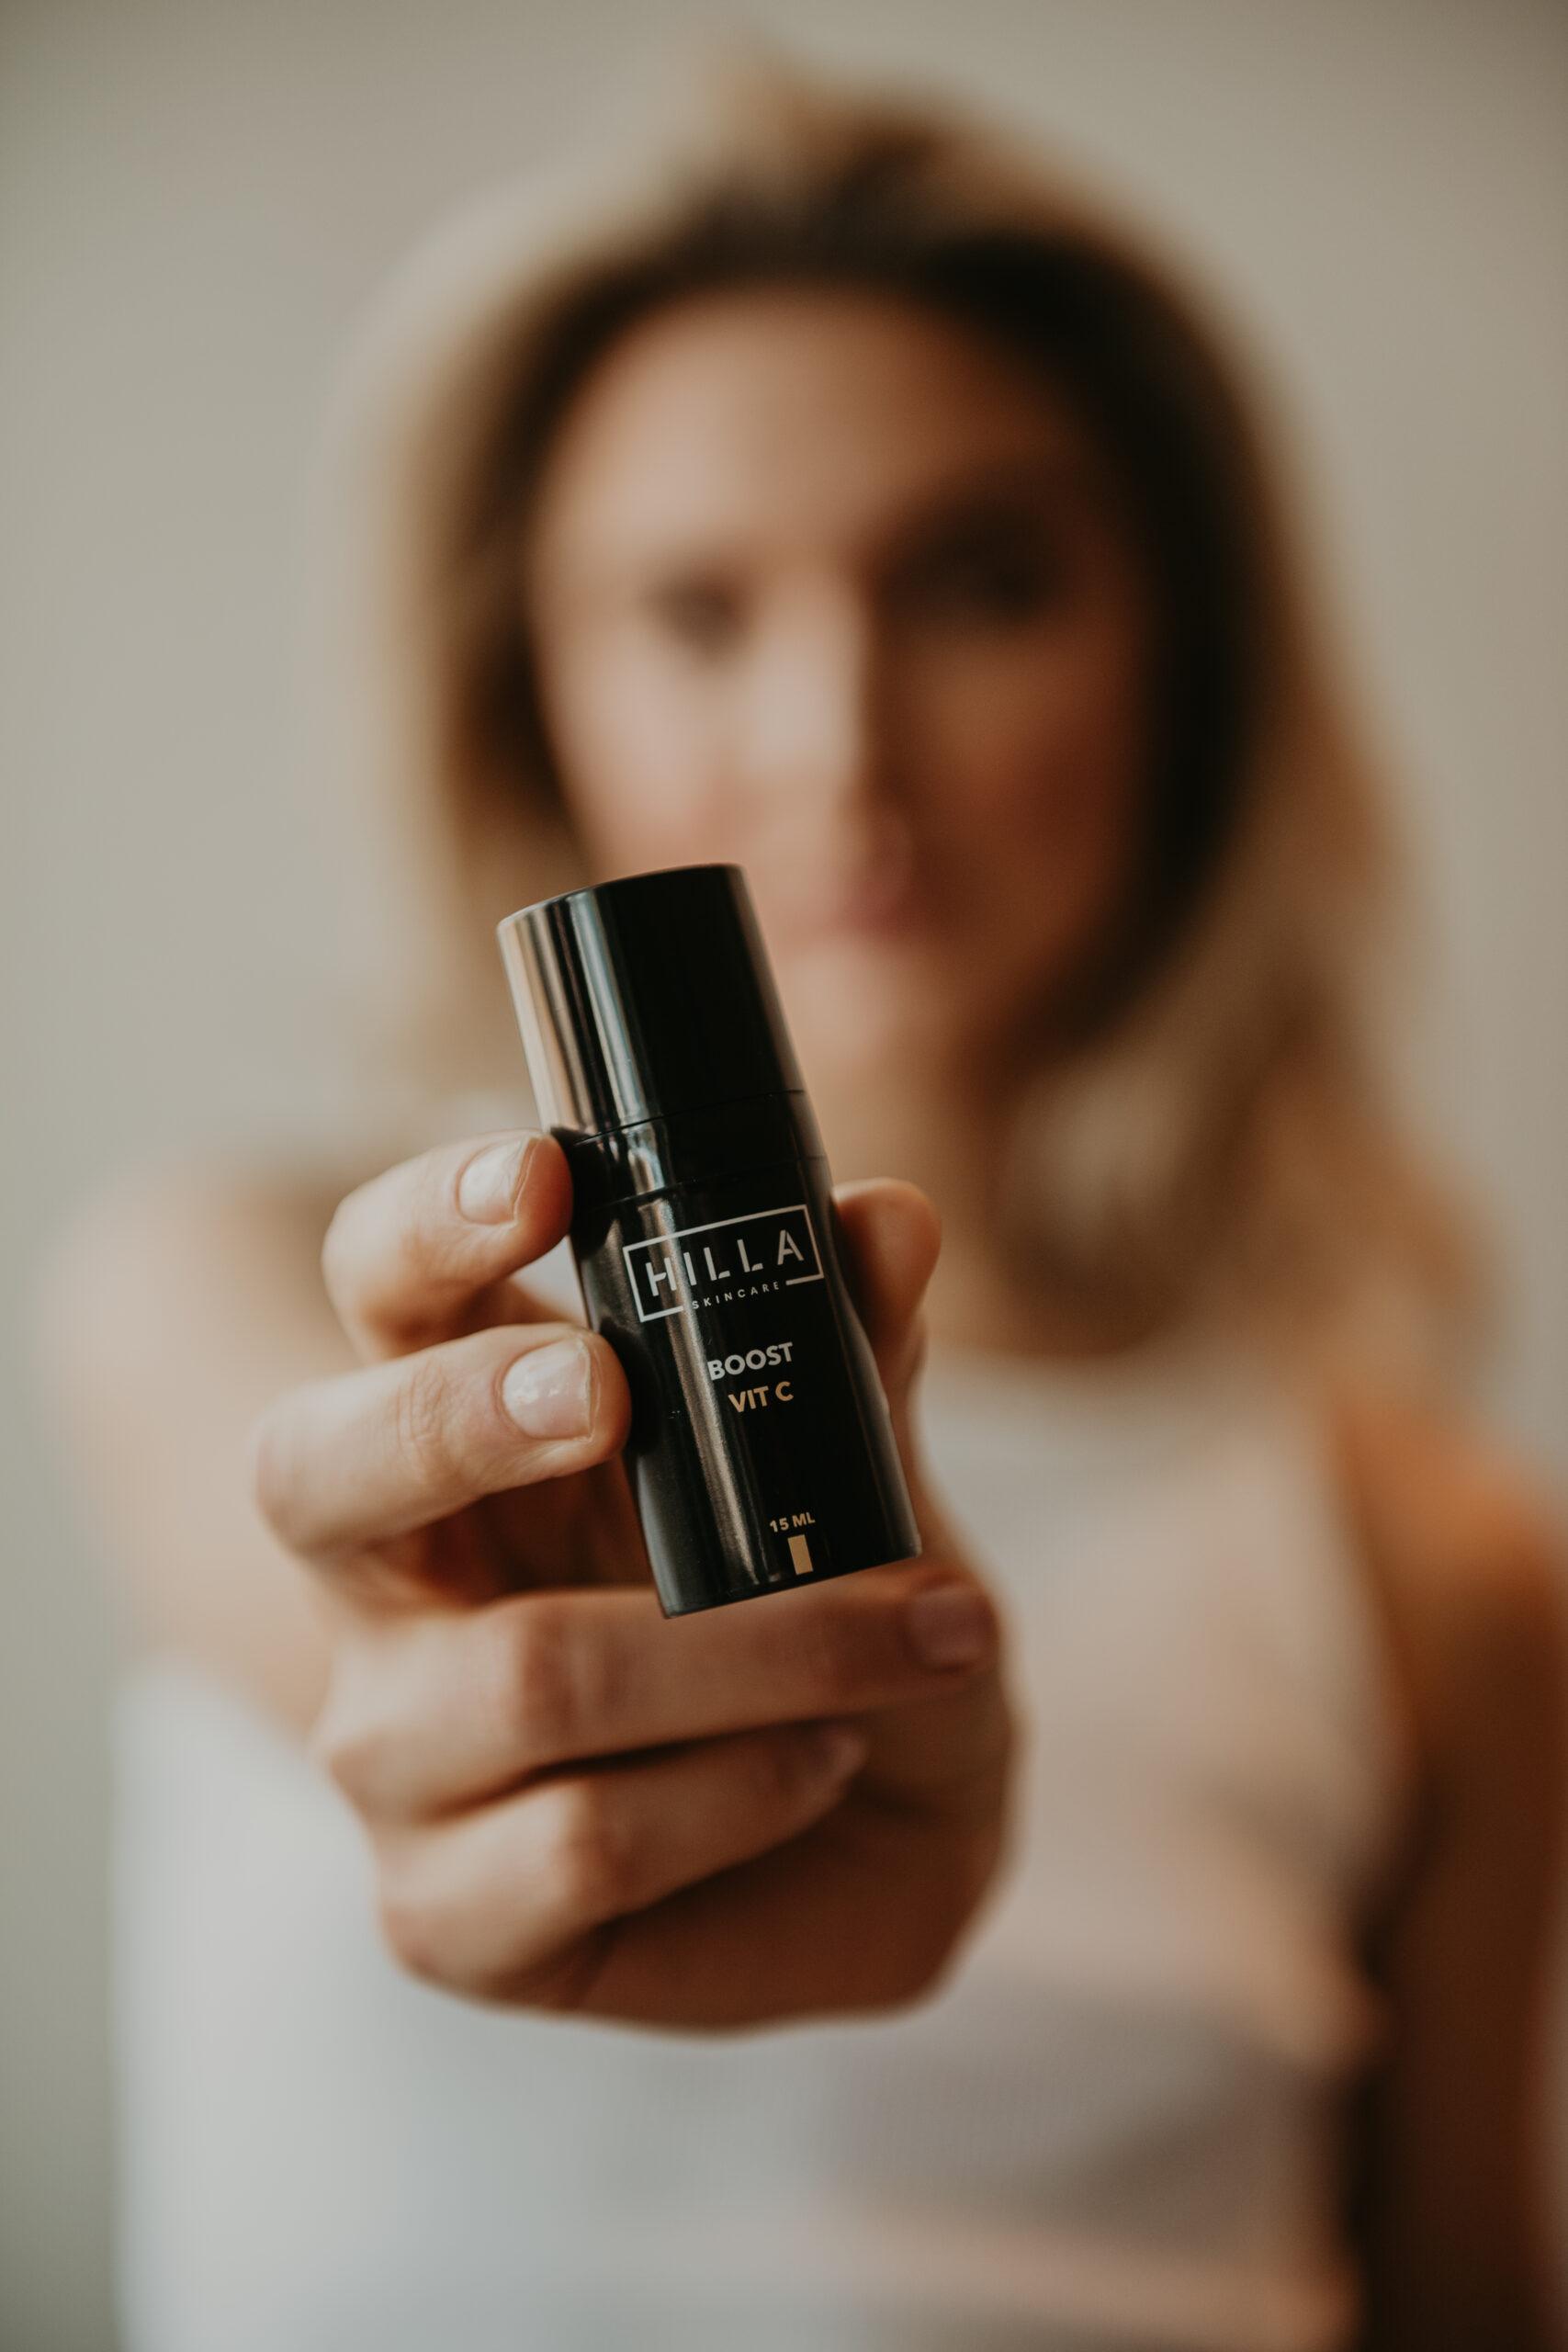 Hilla Skincare - Vit C Boost